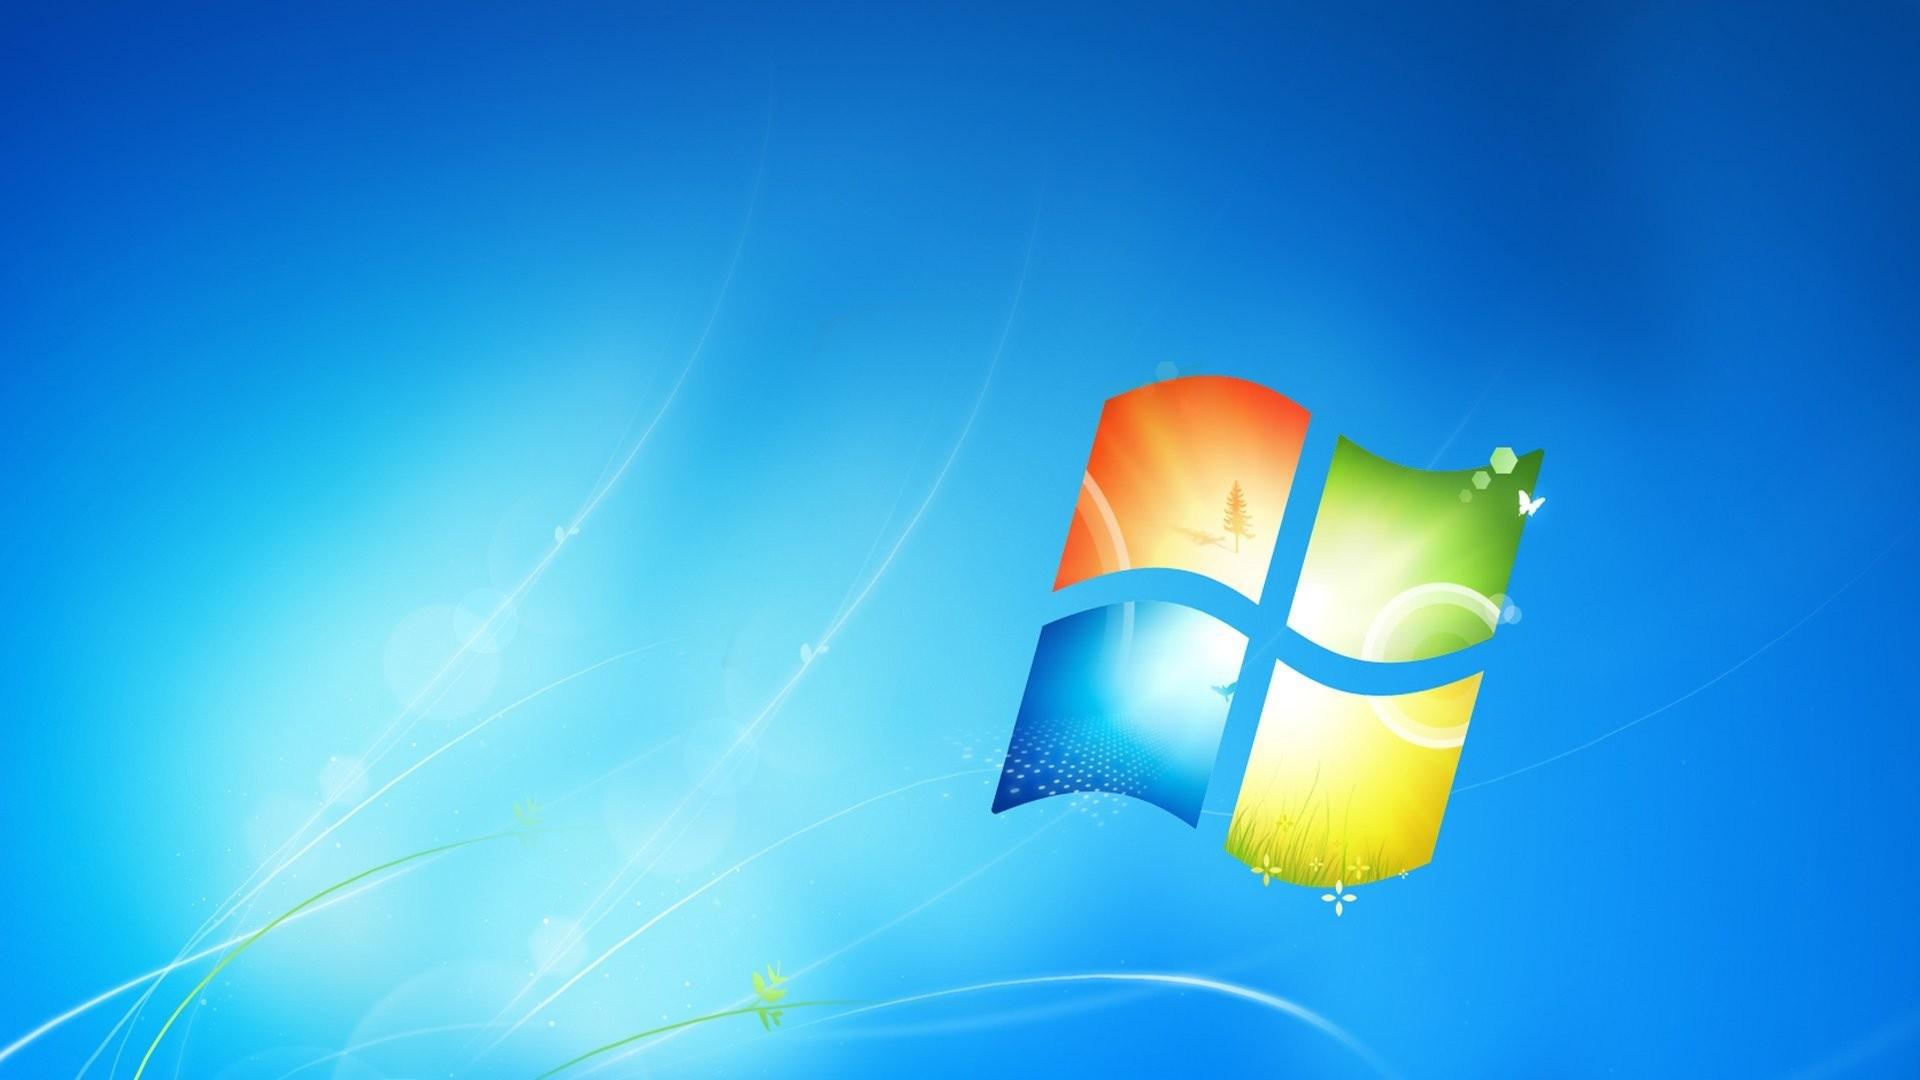 Windows 7 Original Backgrounds (71 Wallpapers)